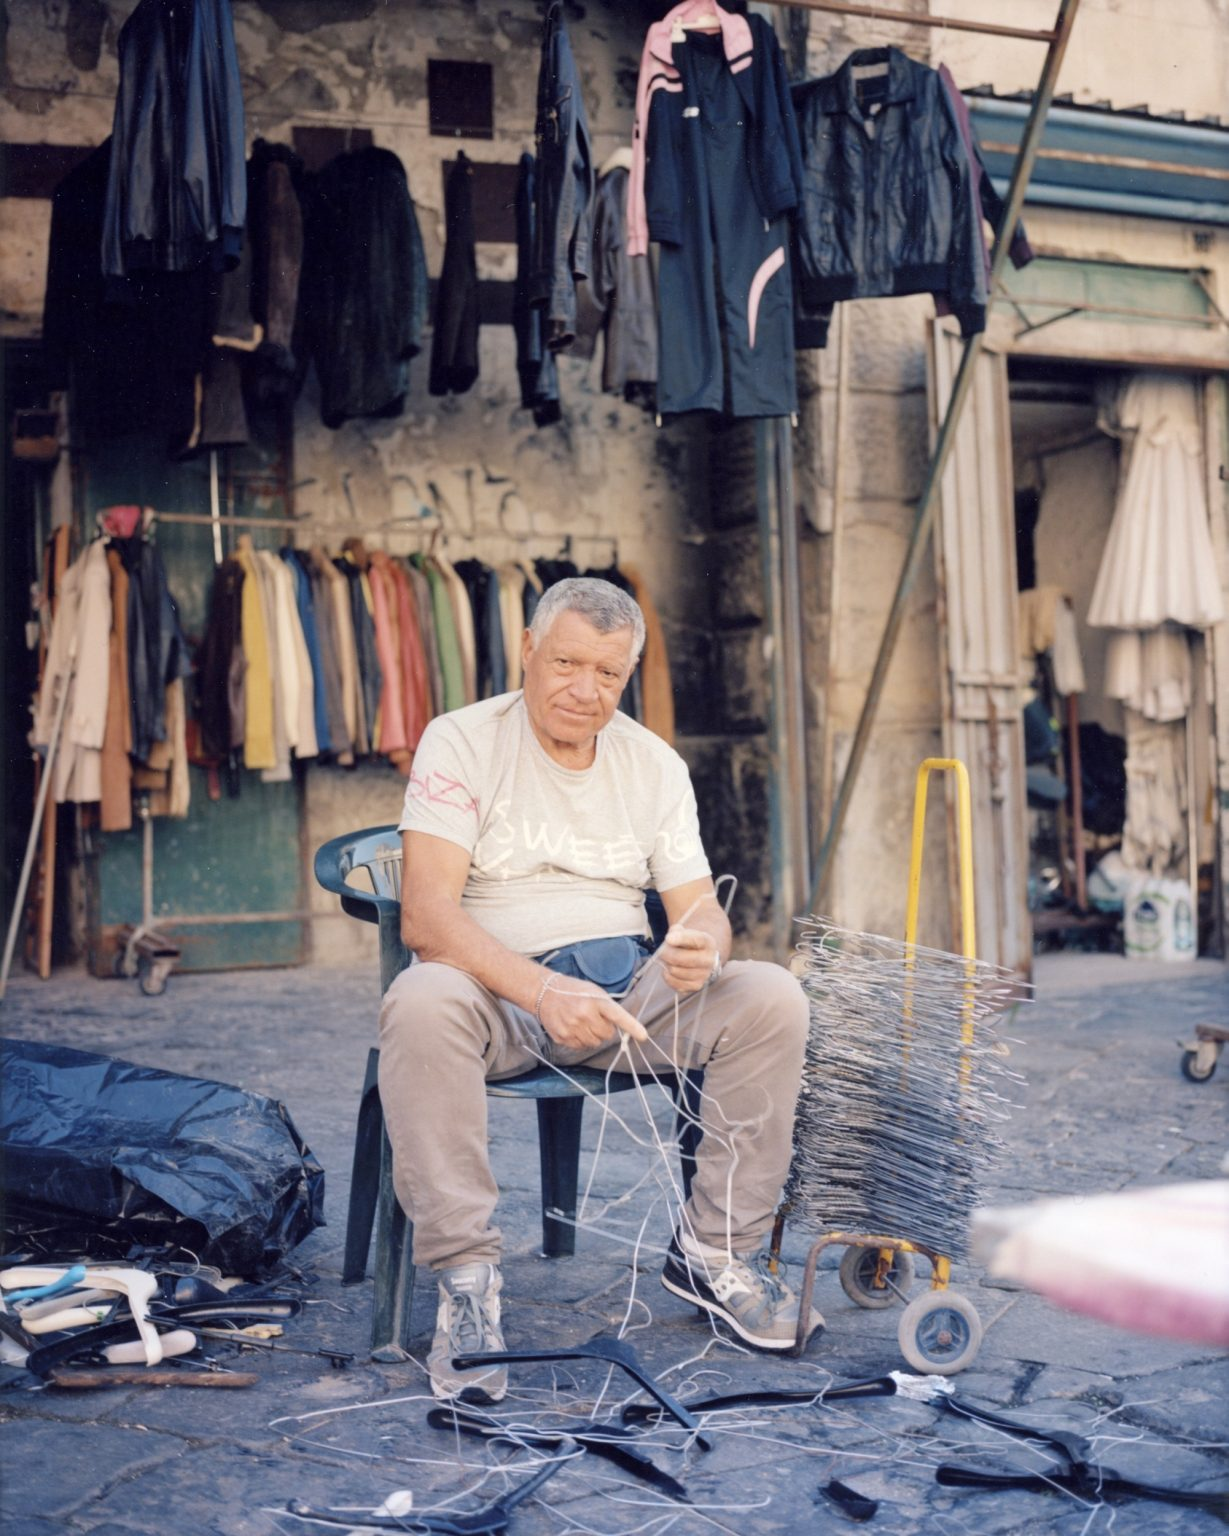 Coat salesman at the Meracato di Resina. Paesi Vesuviani, Province of Naples. 2020